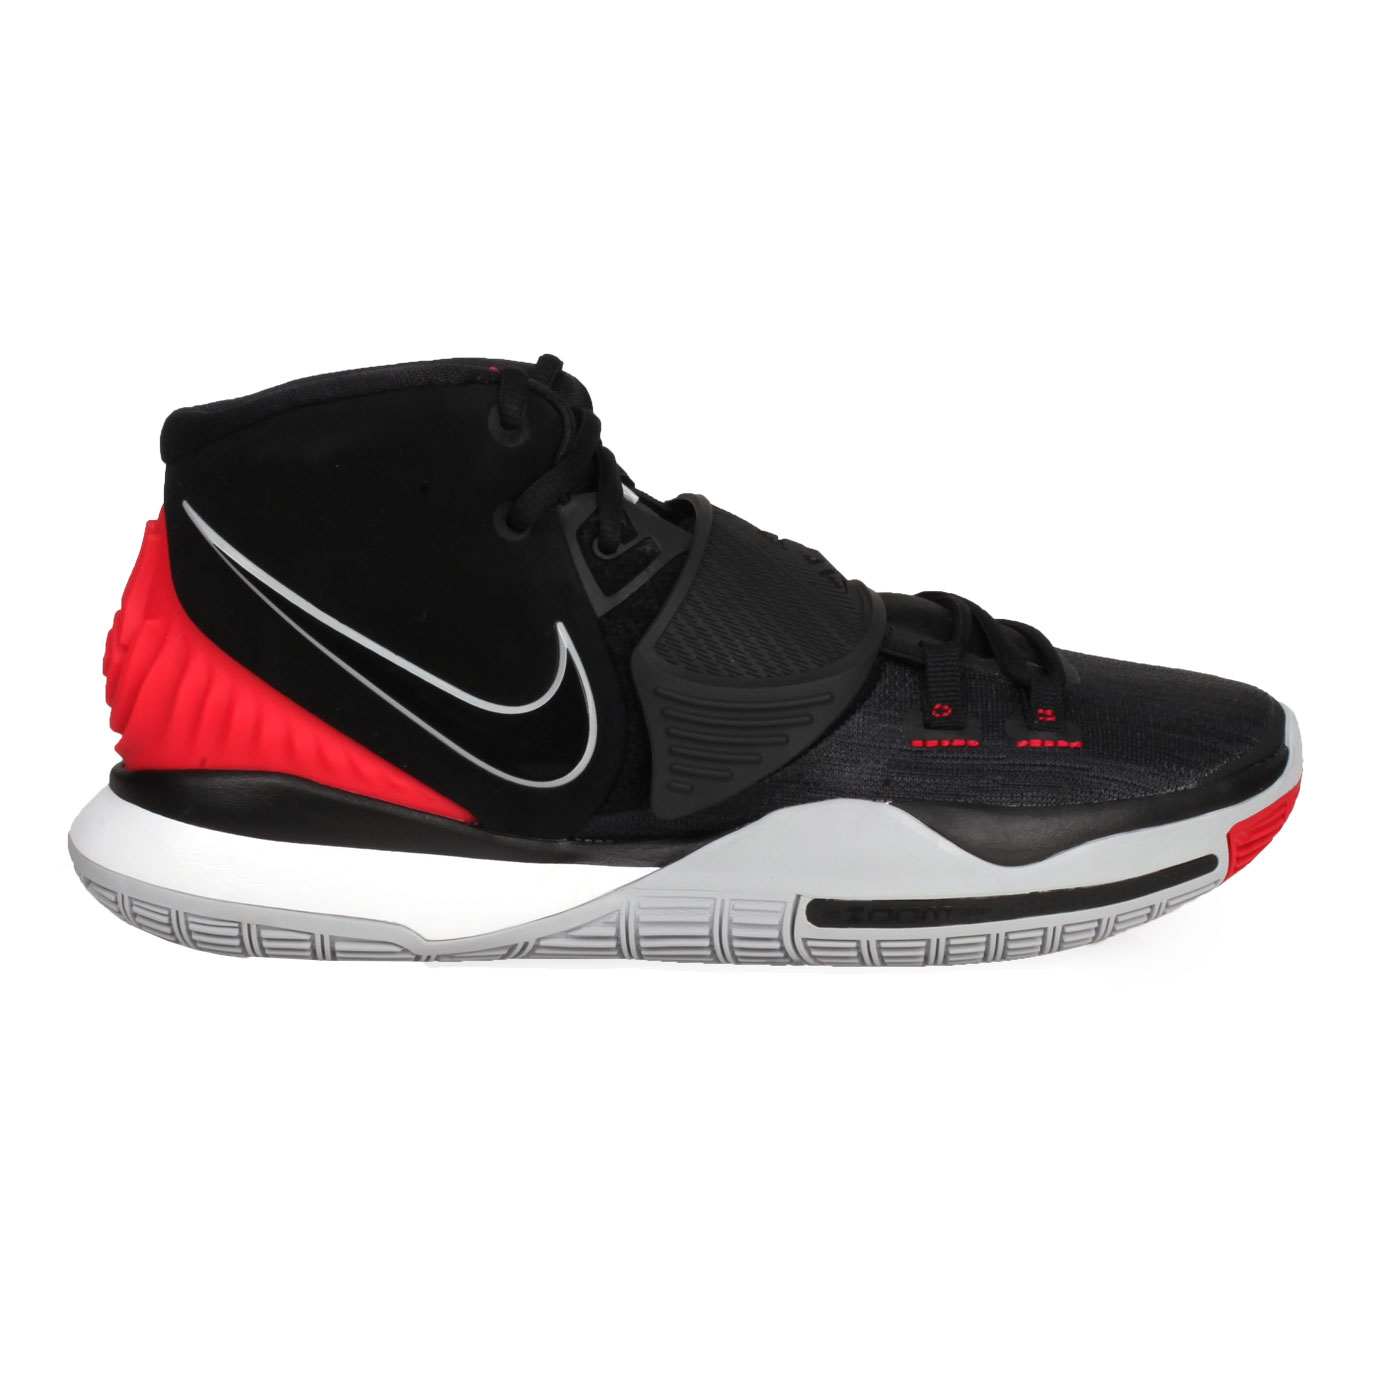 NIKE 男款籃球鞋  @KYRIE 6 EP@BQ4631002 - 黑灰紅